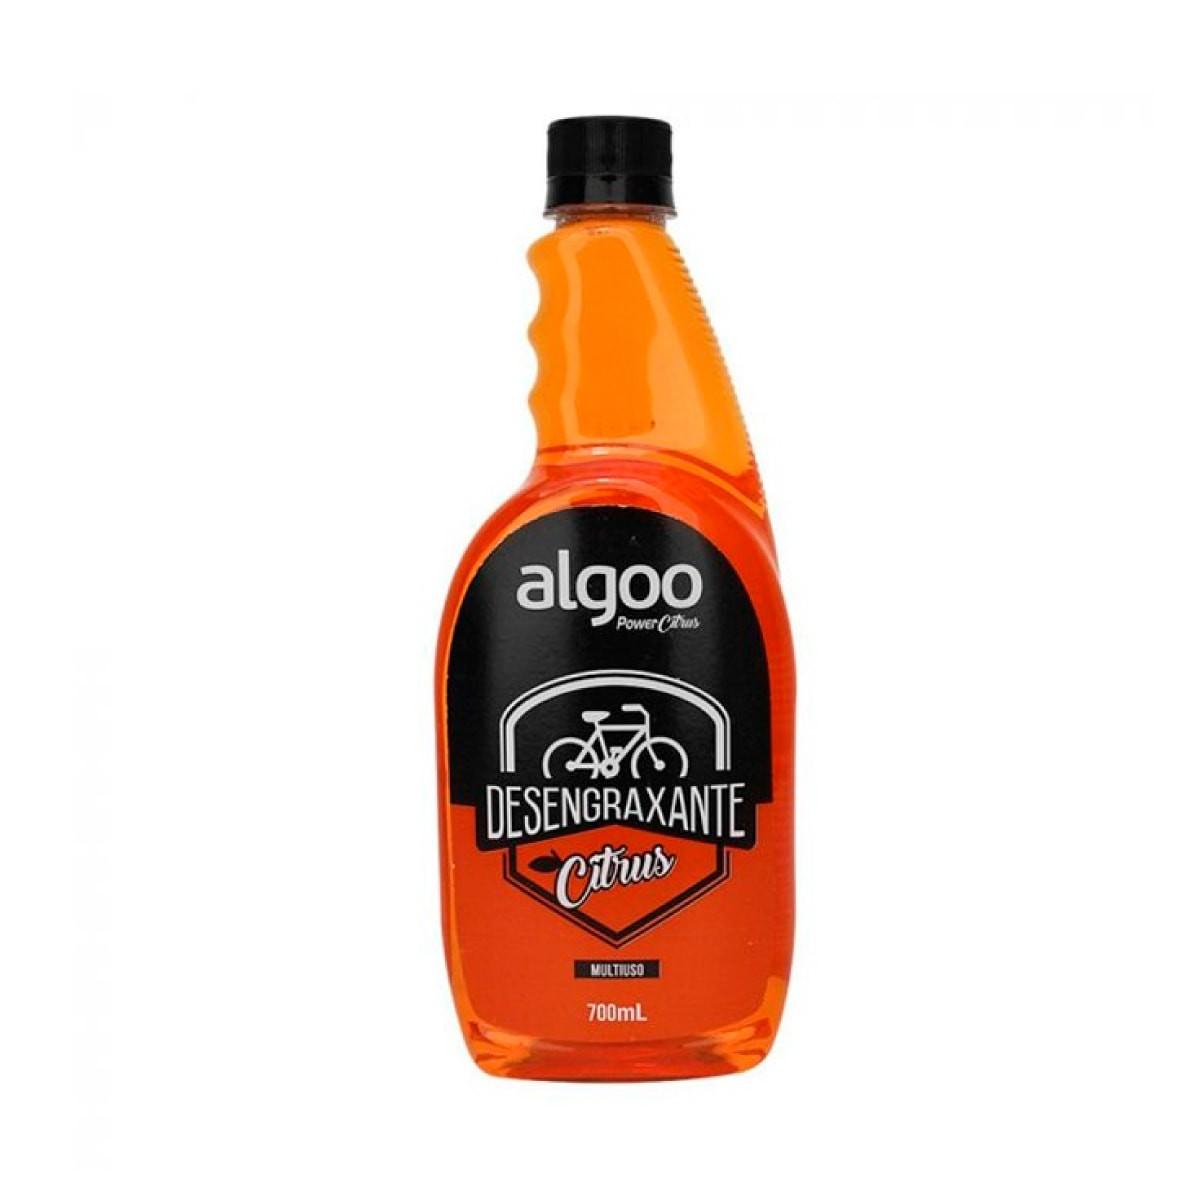 Desengraxante Liquido Algoo Power Citrus 700ml